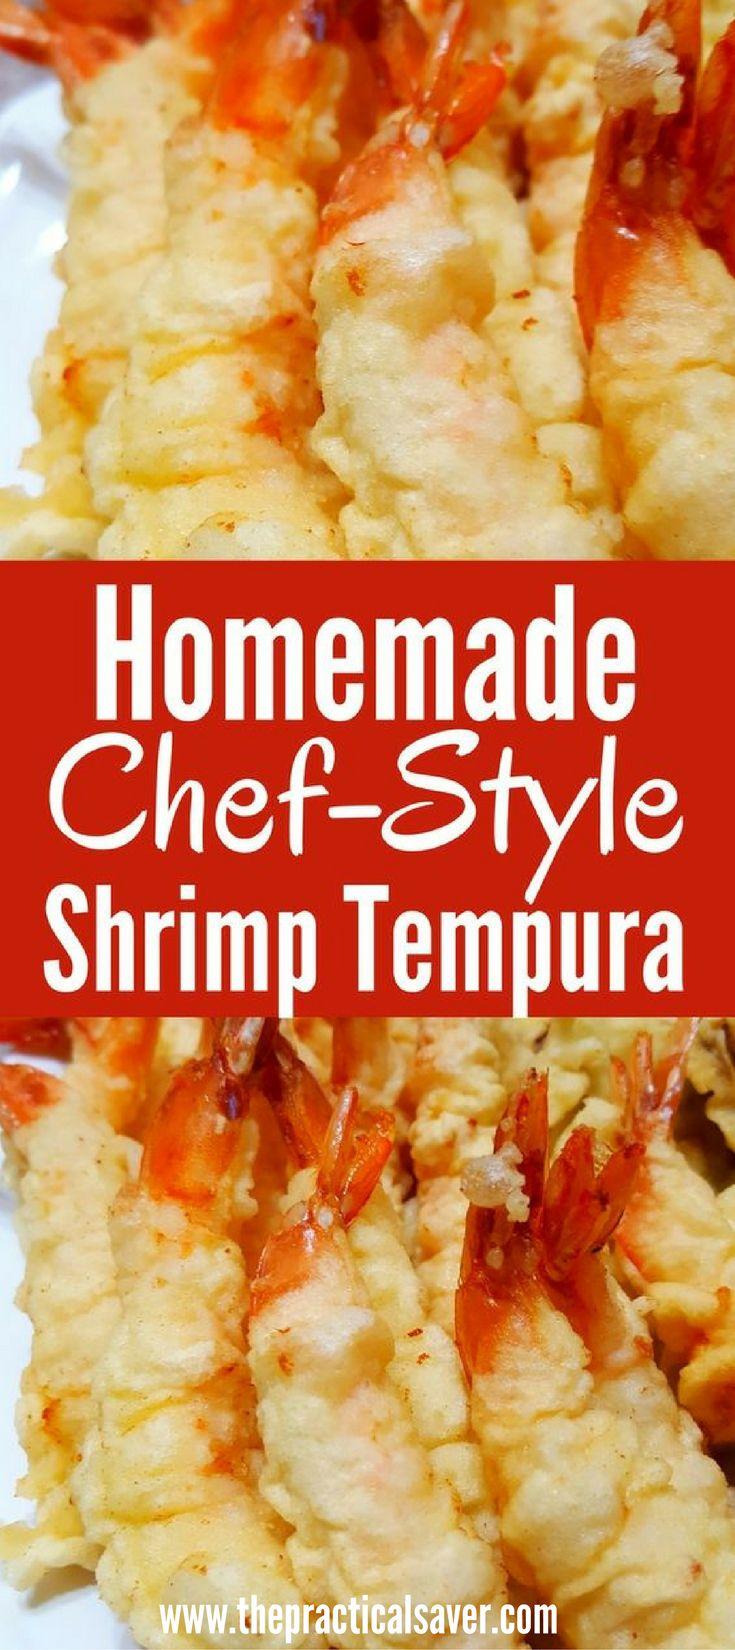 homemade shrimp tempura batter  traditional japanese food recipes l best food recipes ever ideas l easy healthy food recipes on a budget l grocery on a budget l healthy budget meals for a large families – Ronda Ling